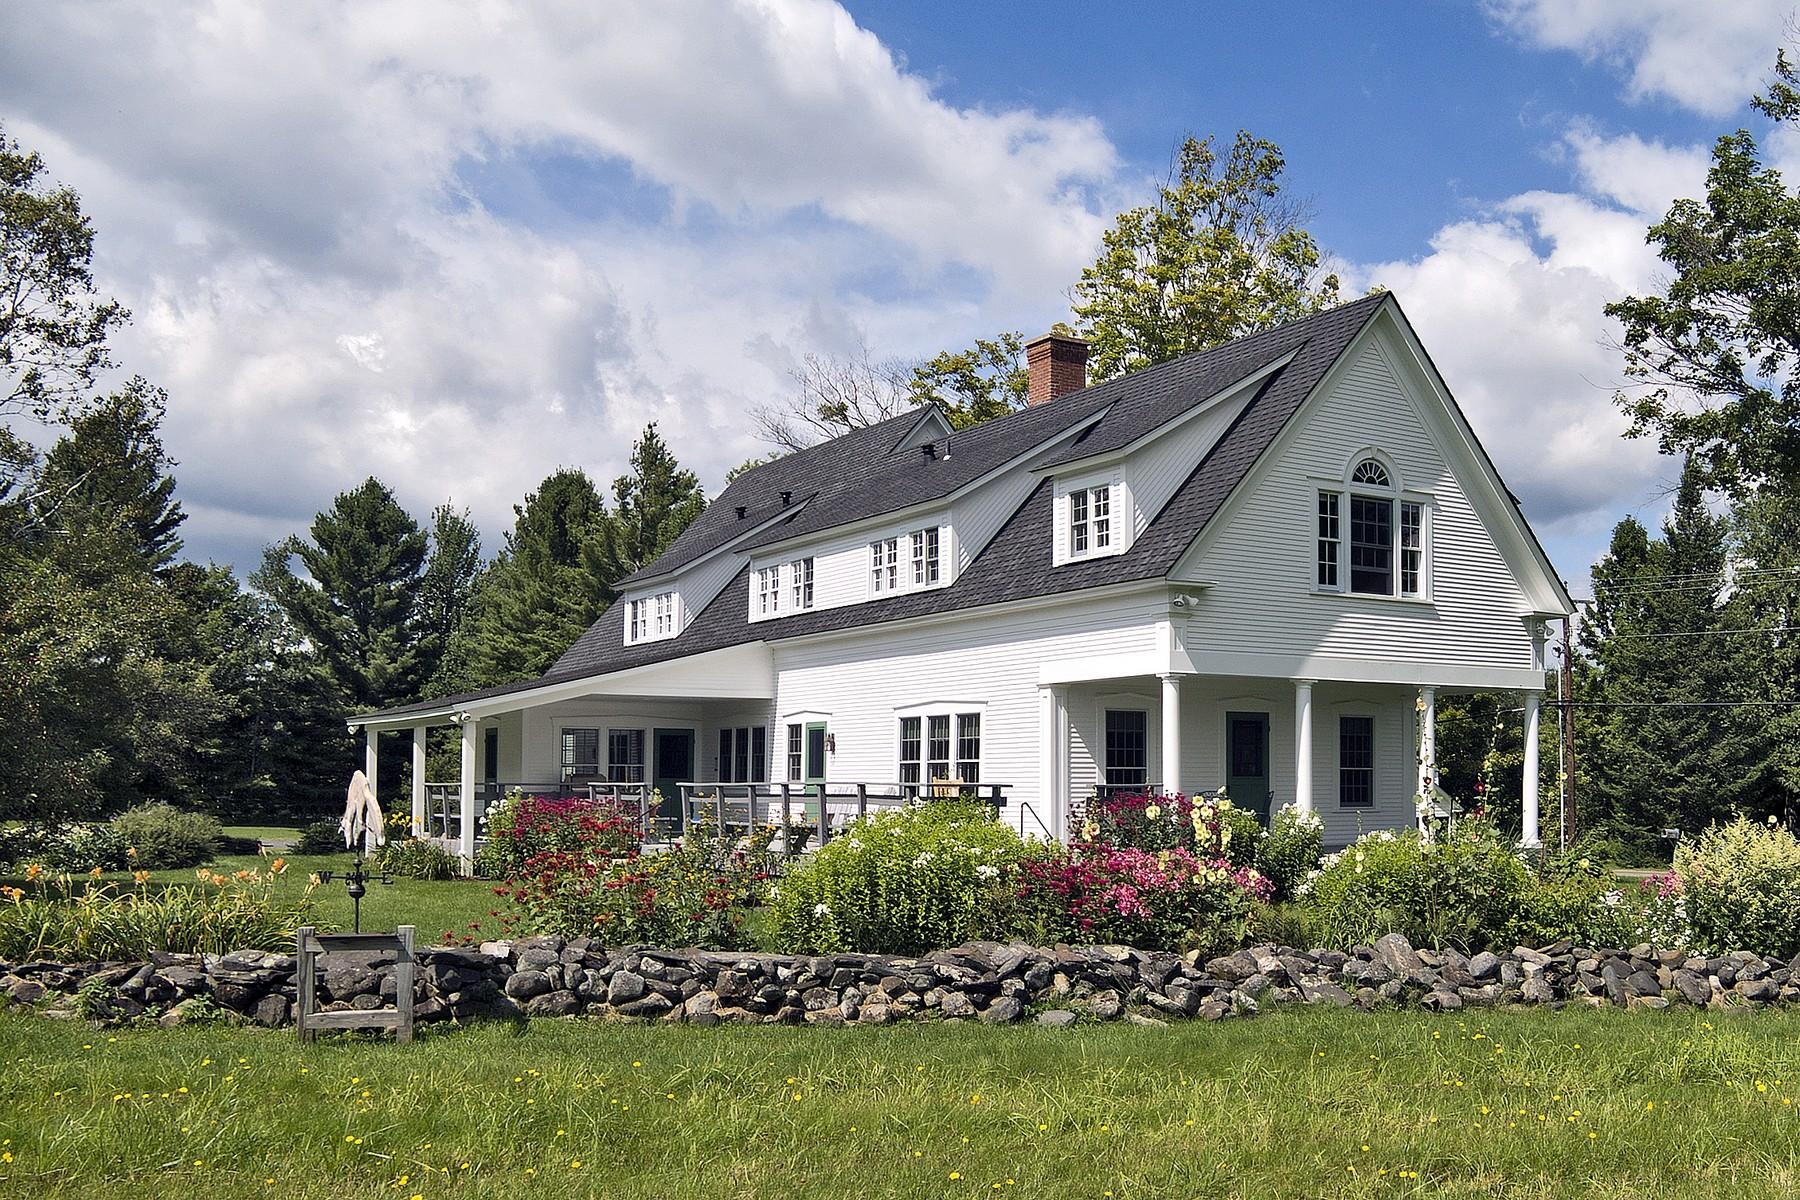 Casa Unifamiliar por un Venta en Fox Meadow Farm One of the Loveliest Vermont Lake 1863 Lake Shore Rd Greensboro, Vermont 05841 Estados Unidos